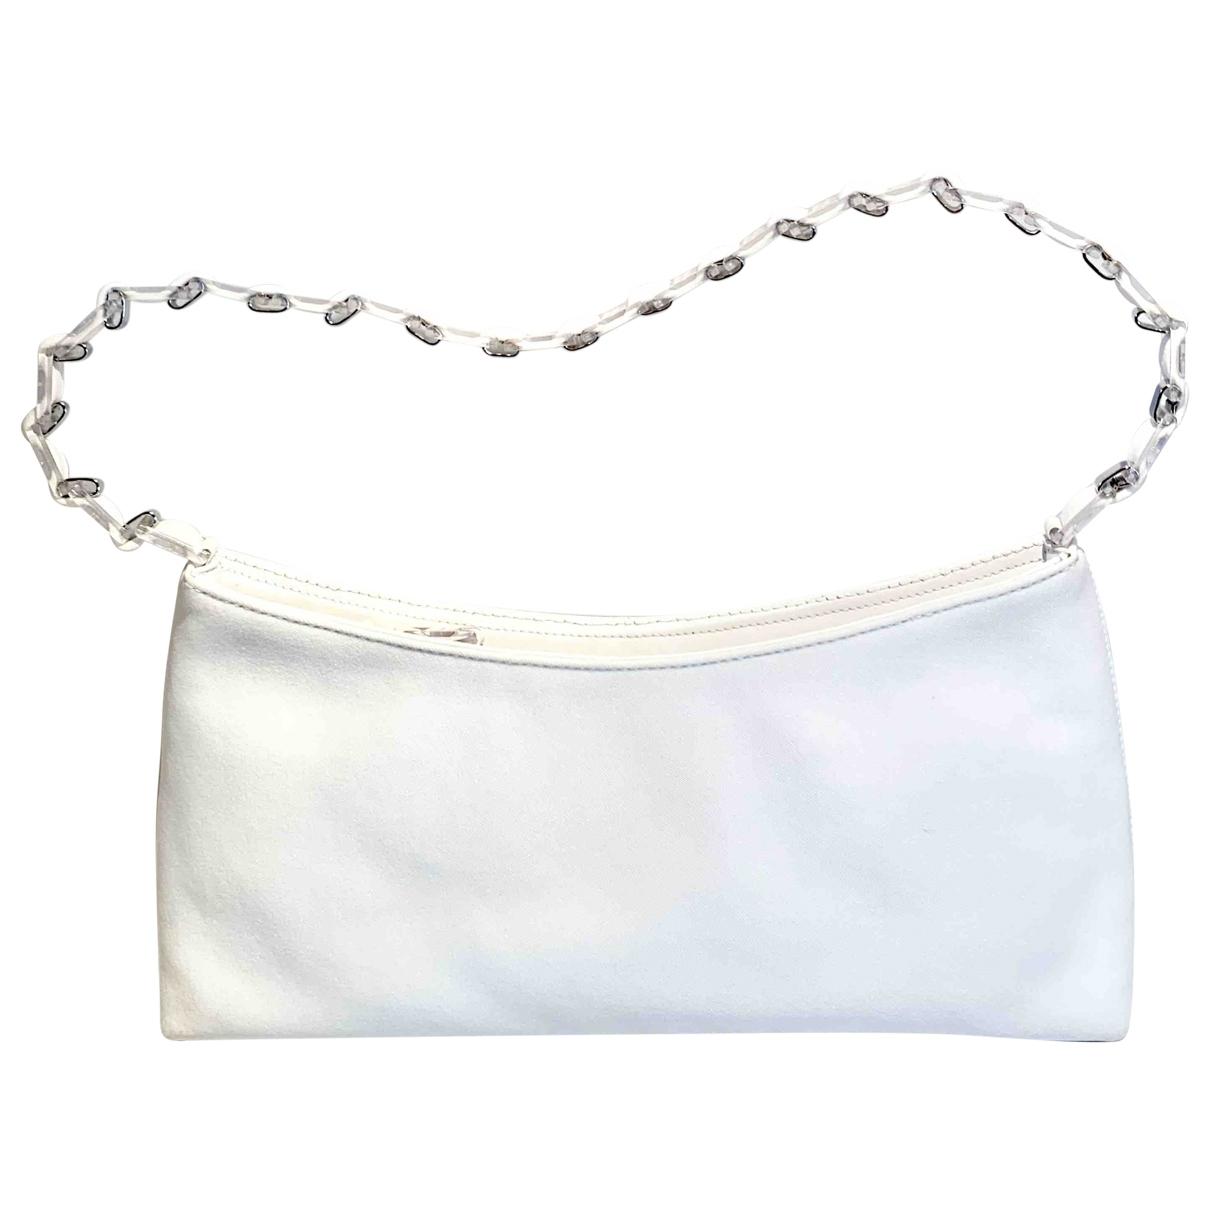 Salvatore Ferragamo \N White Cloth handbag for Women \N